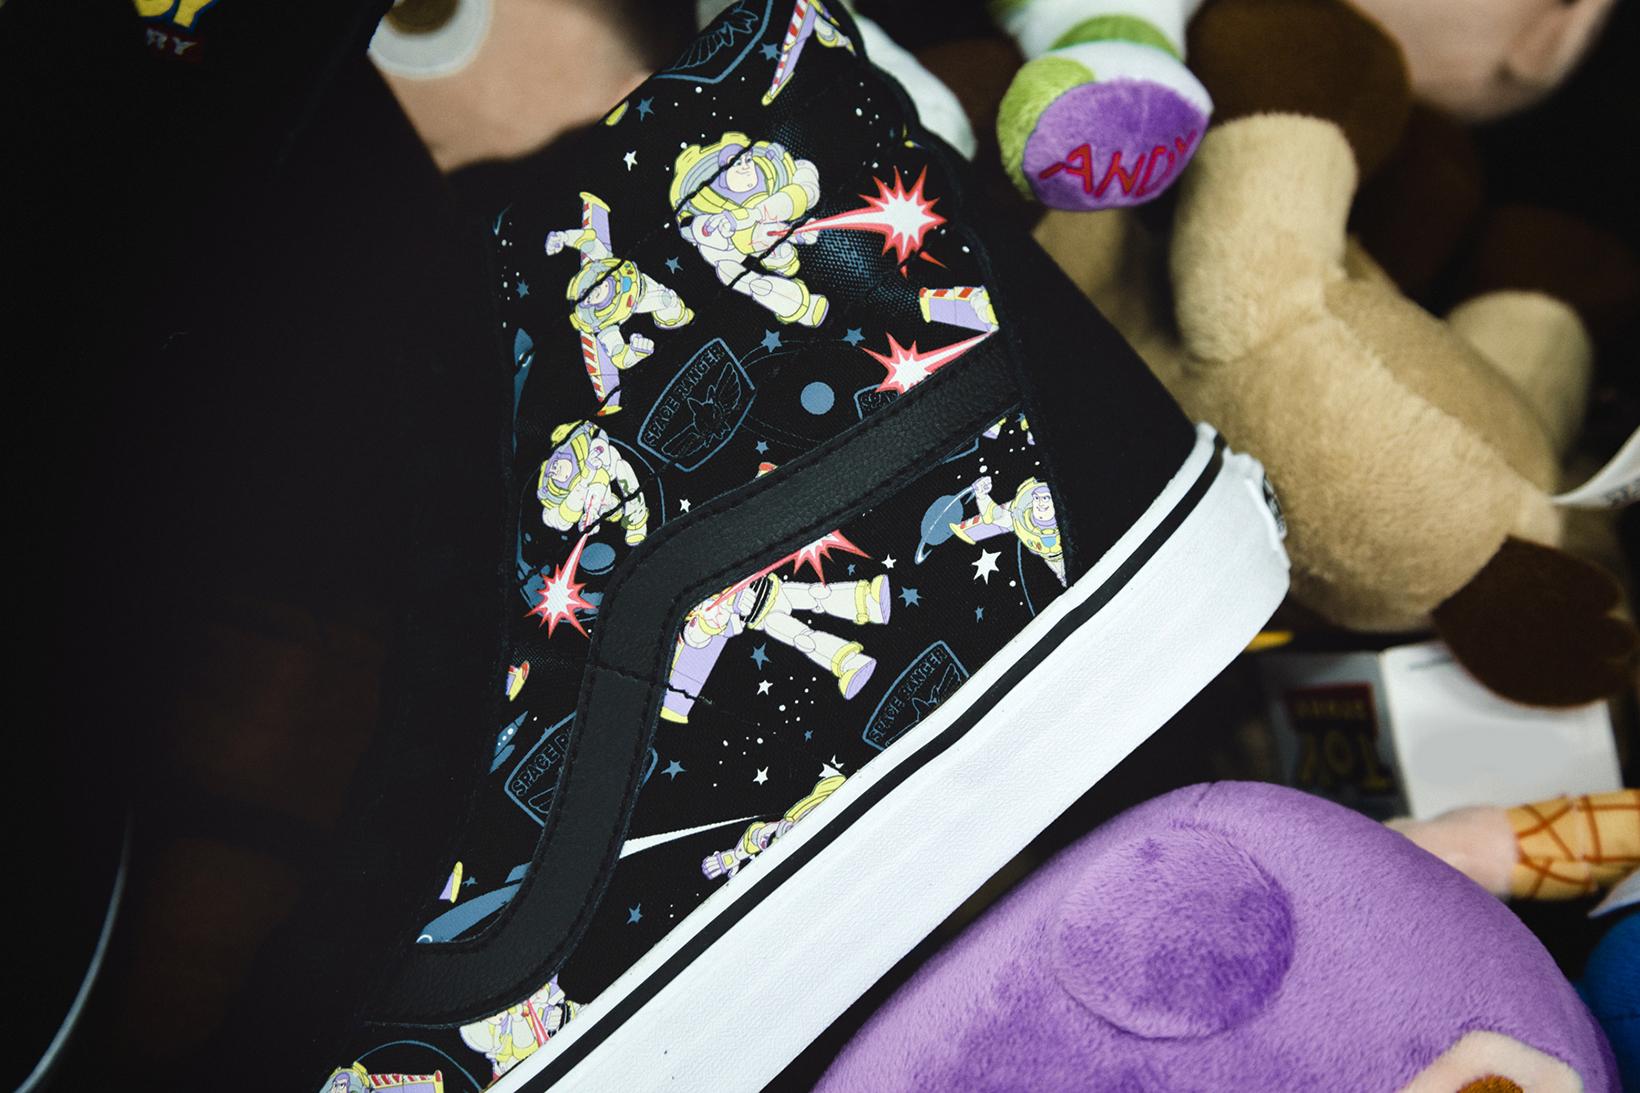 Toy Story Vans Sneakers Woody Buzz Lightyear Disney - 1765042